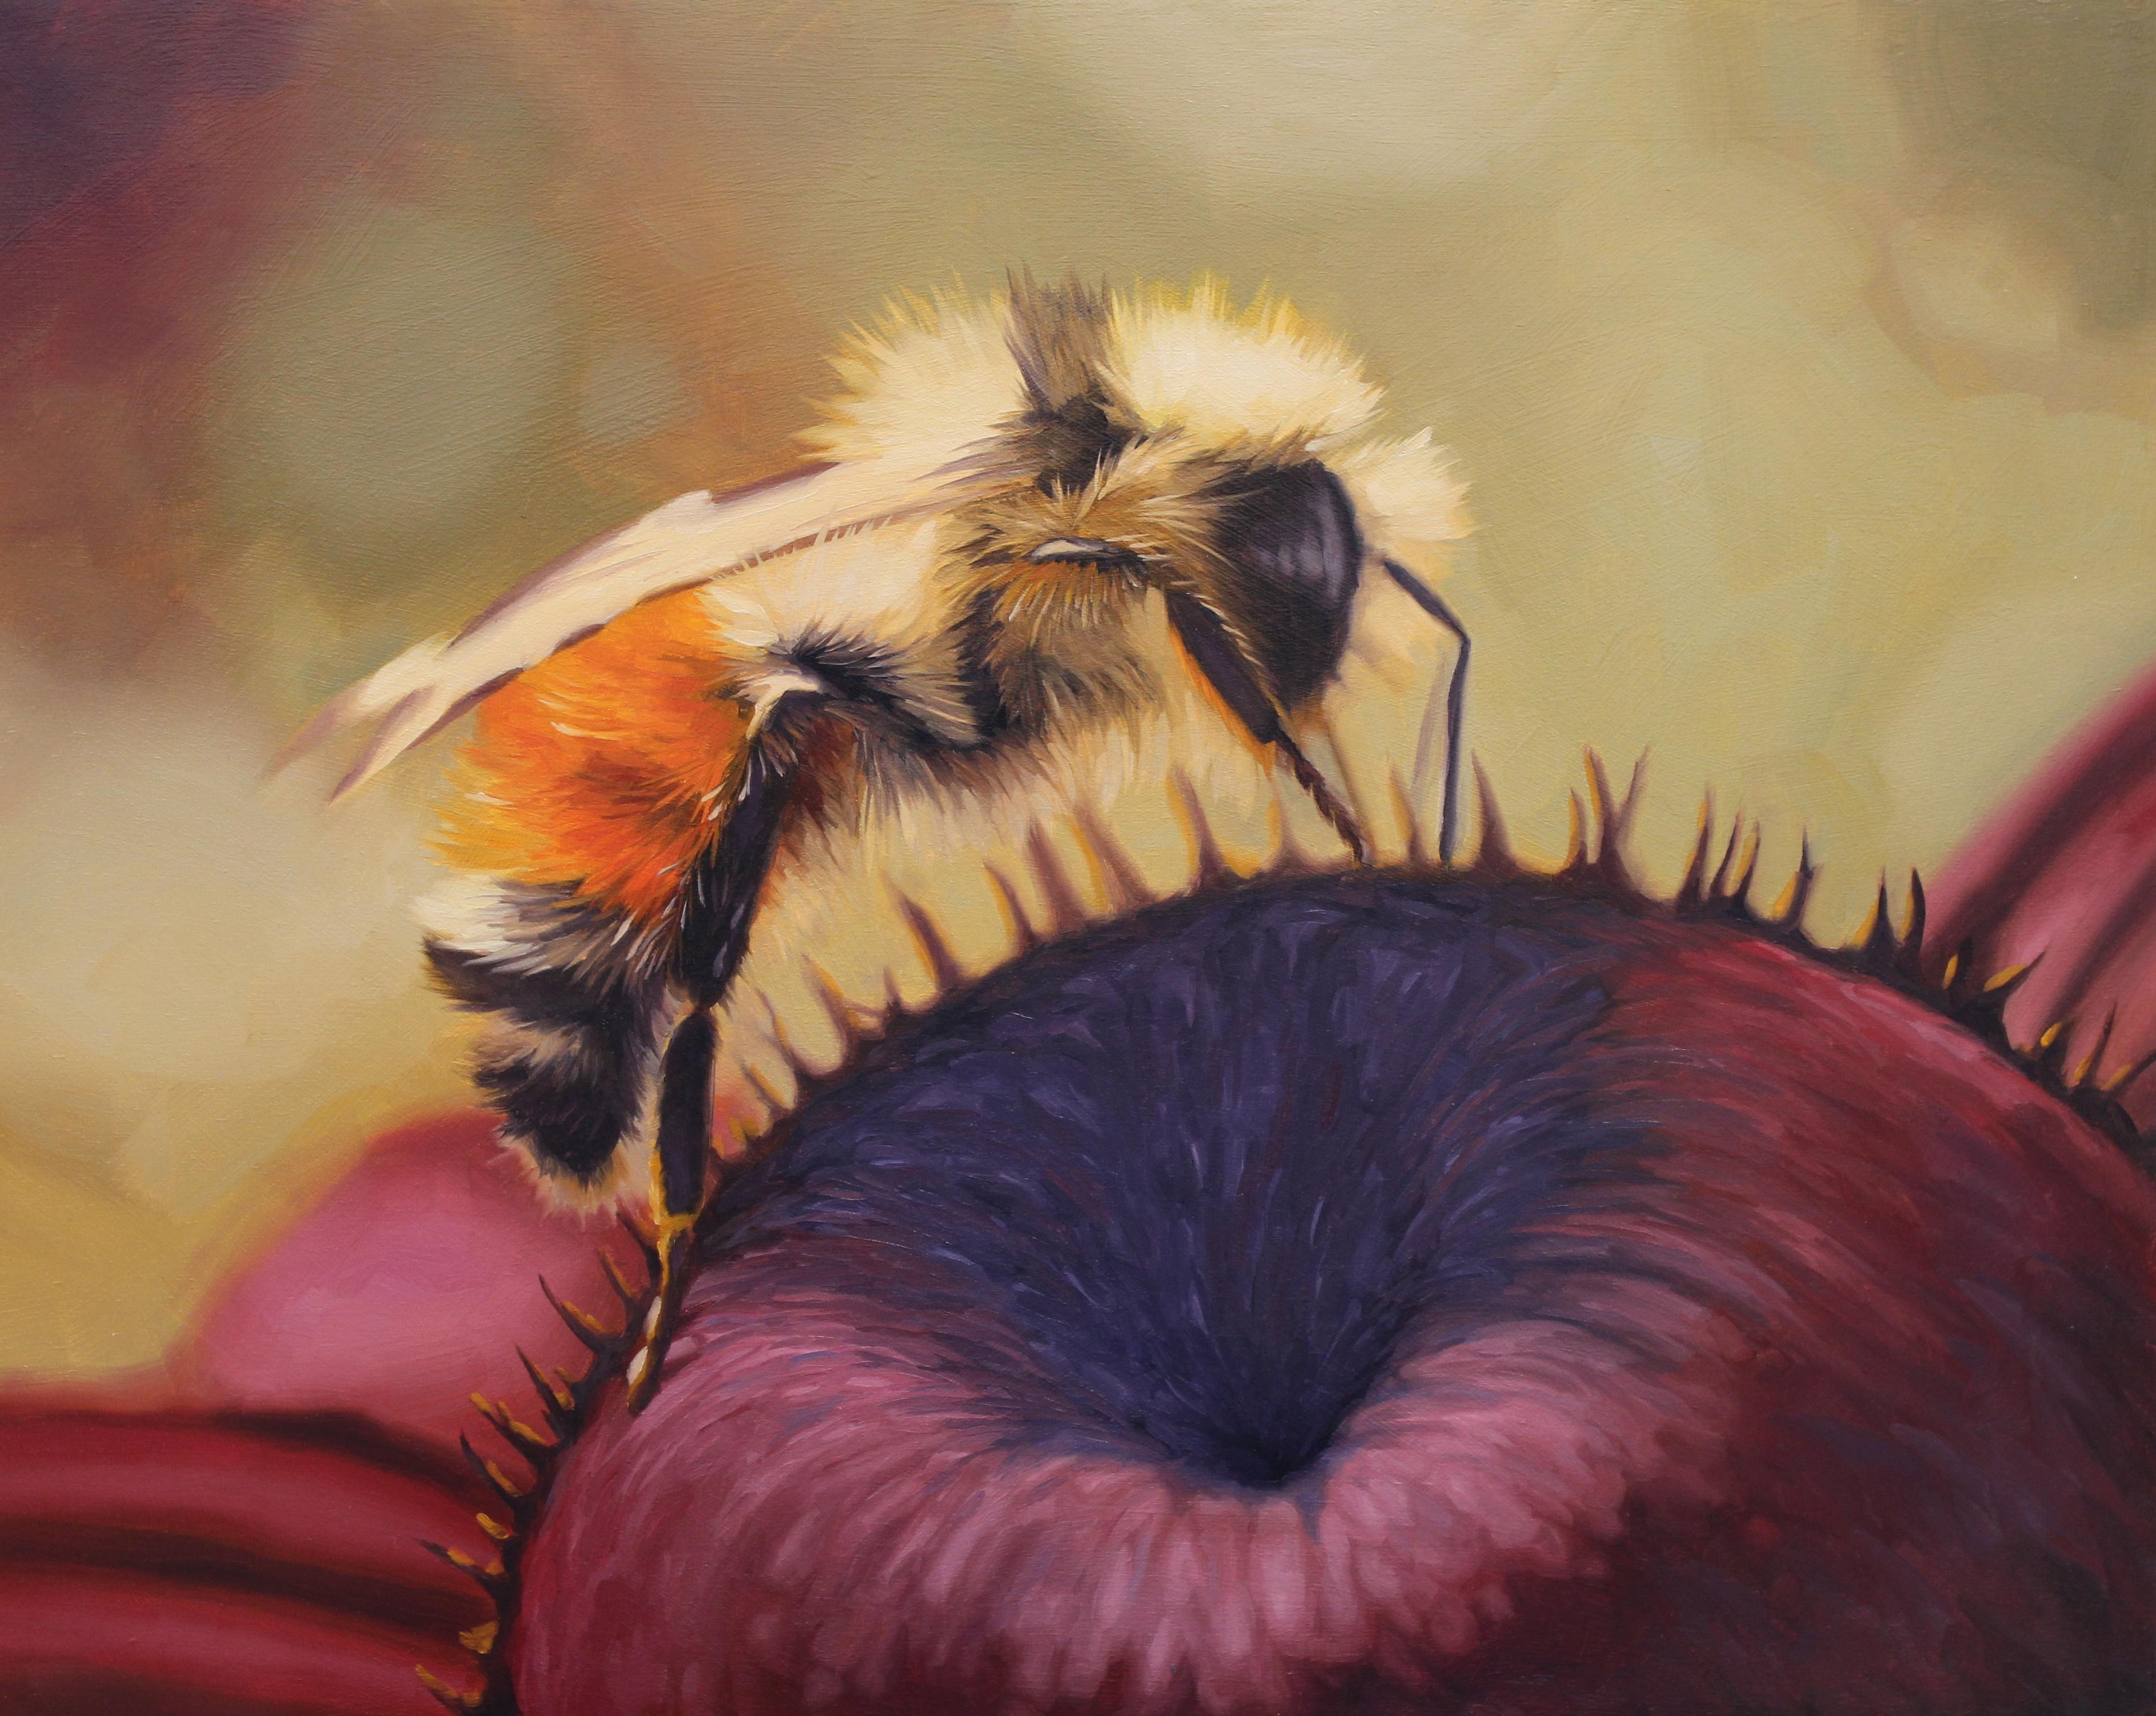 Morning nectar